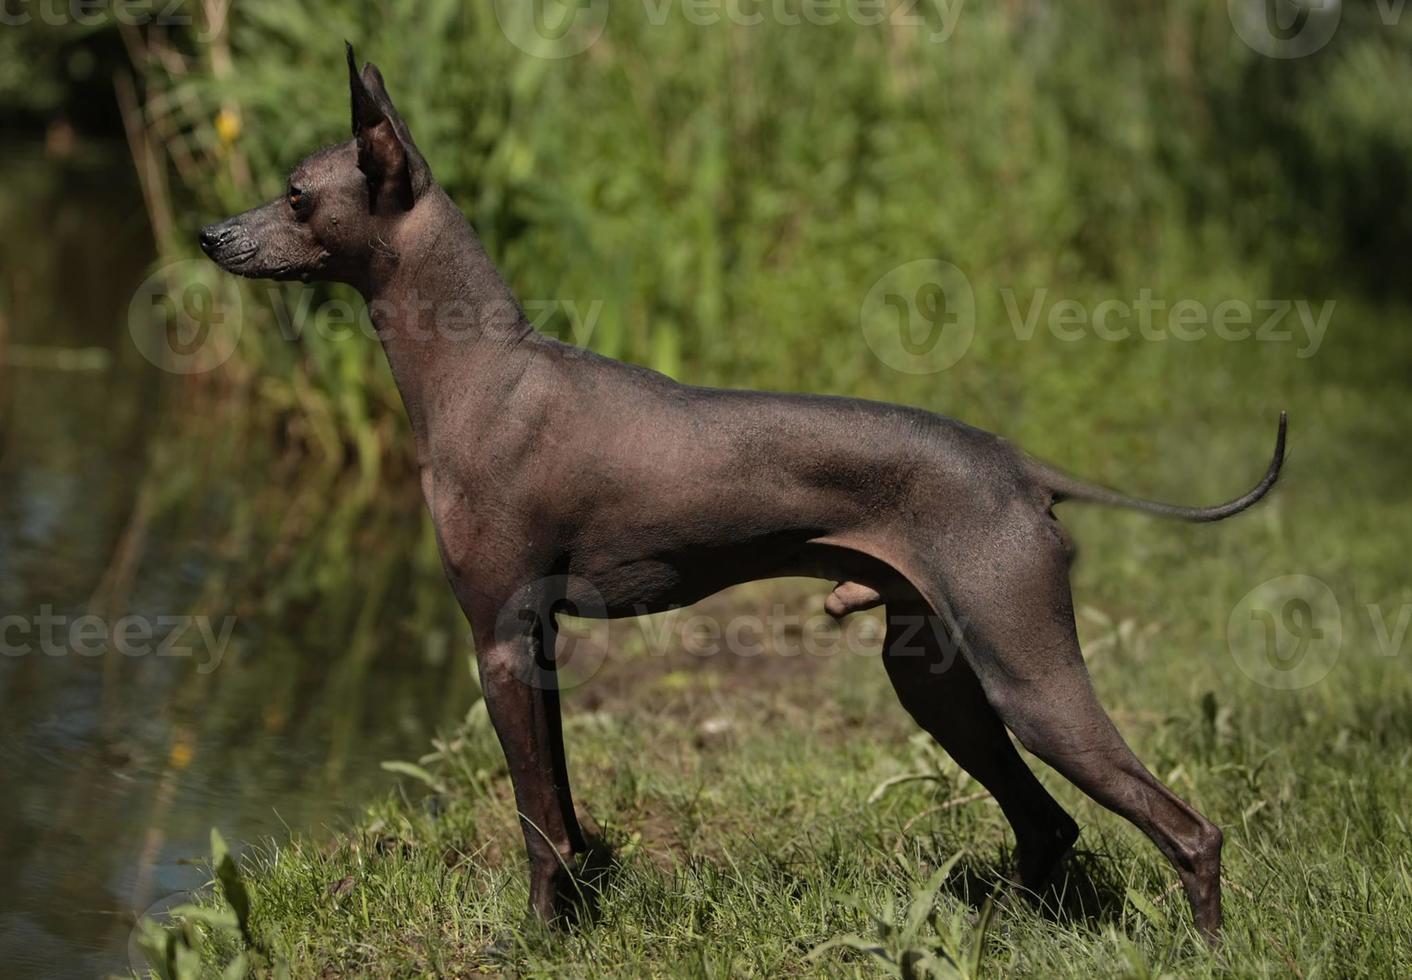 cão calvo peruano, chien noble sagan, peruaanse naakthond, naakthond foto